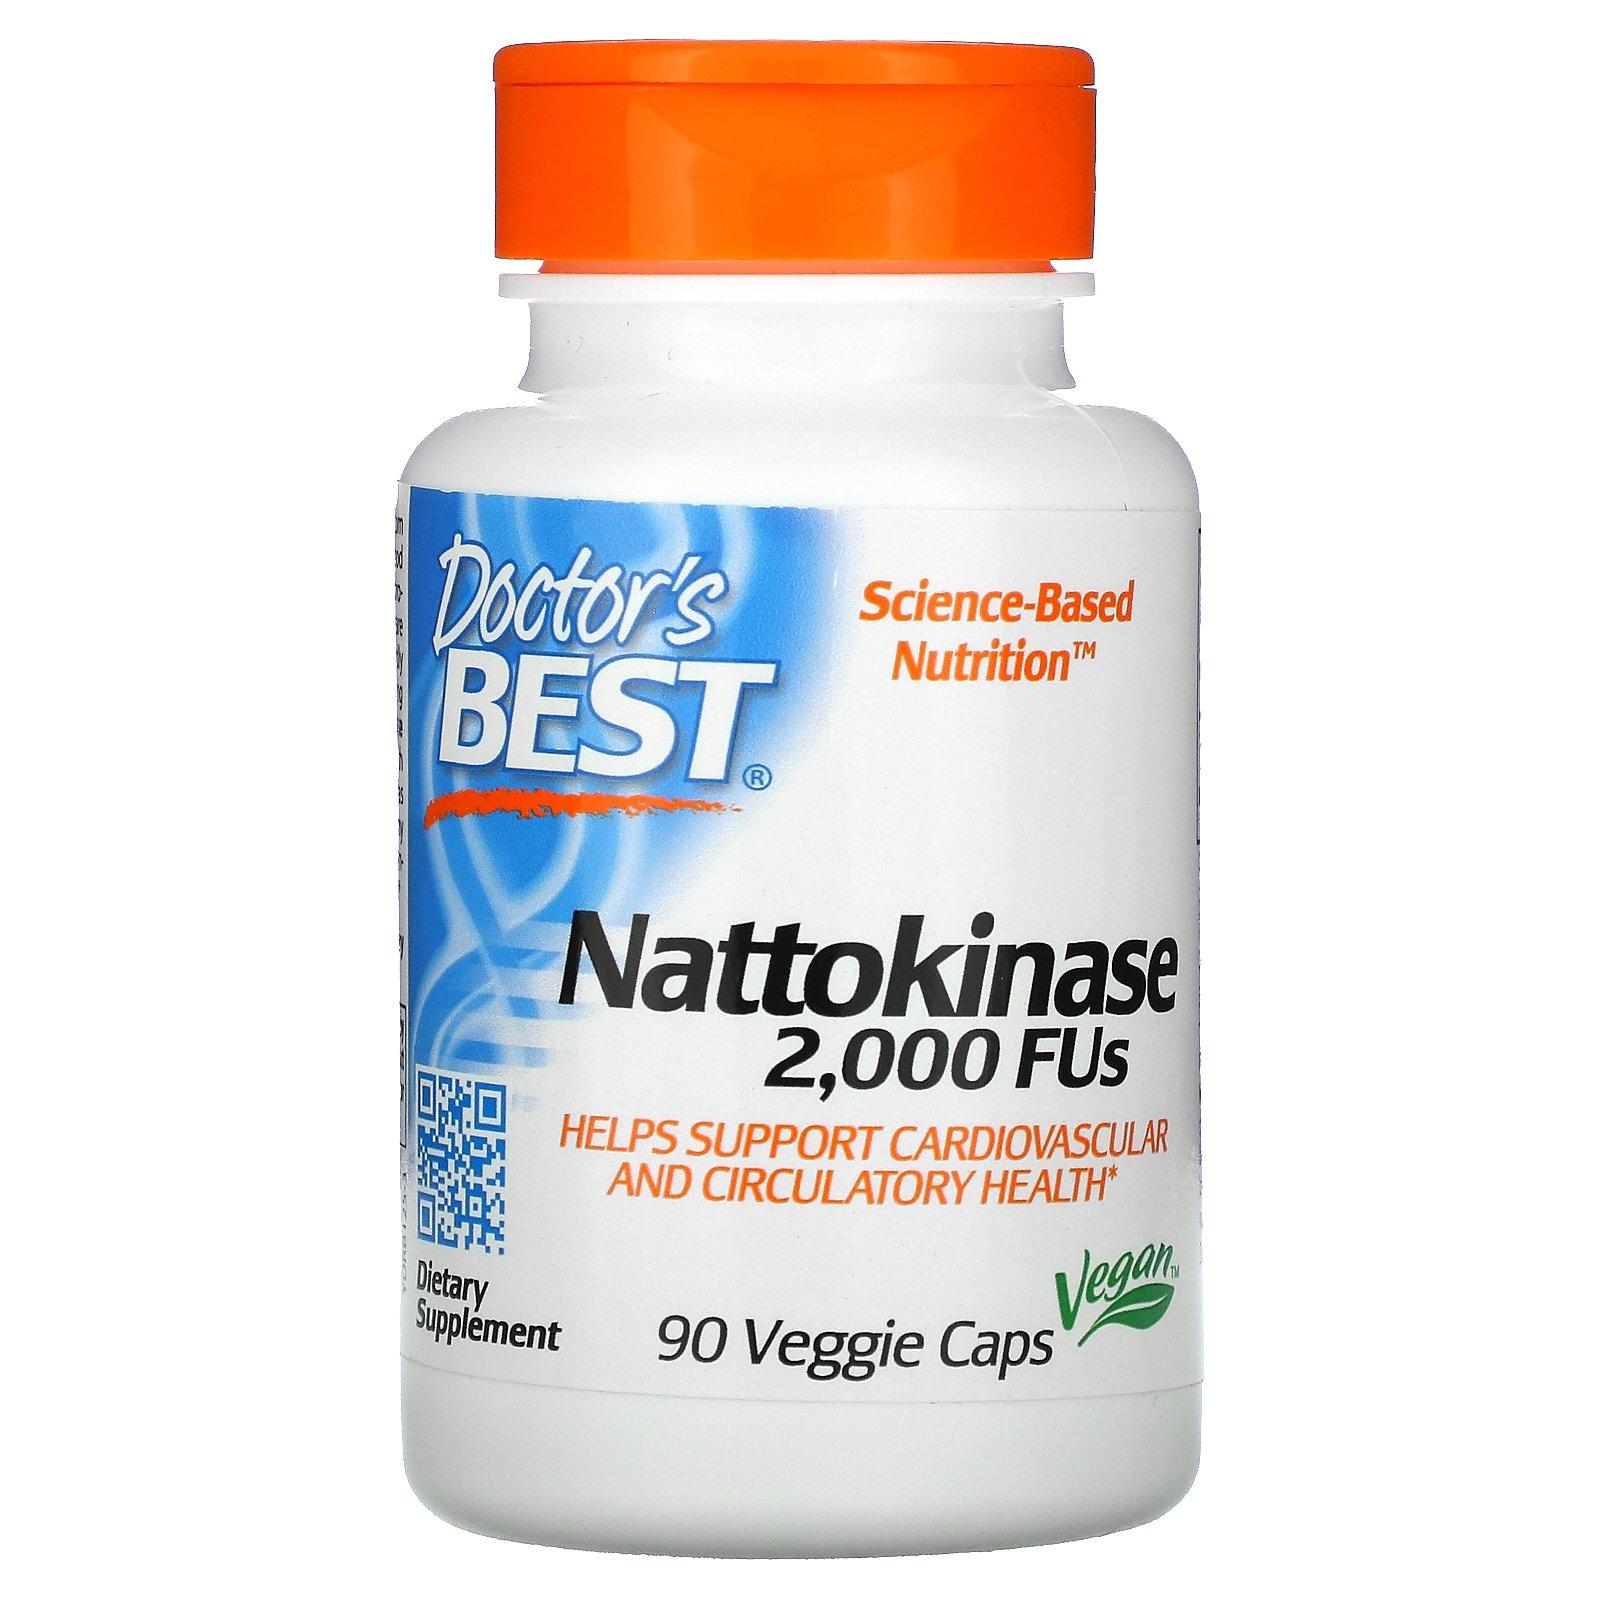 Doctor's Best, наттокиназа, 2000 FU, 90 вегетарианских капсул